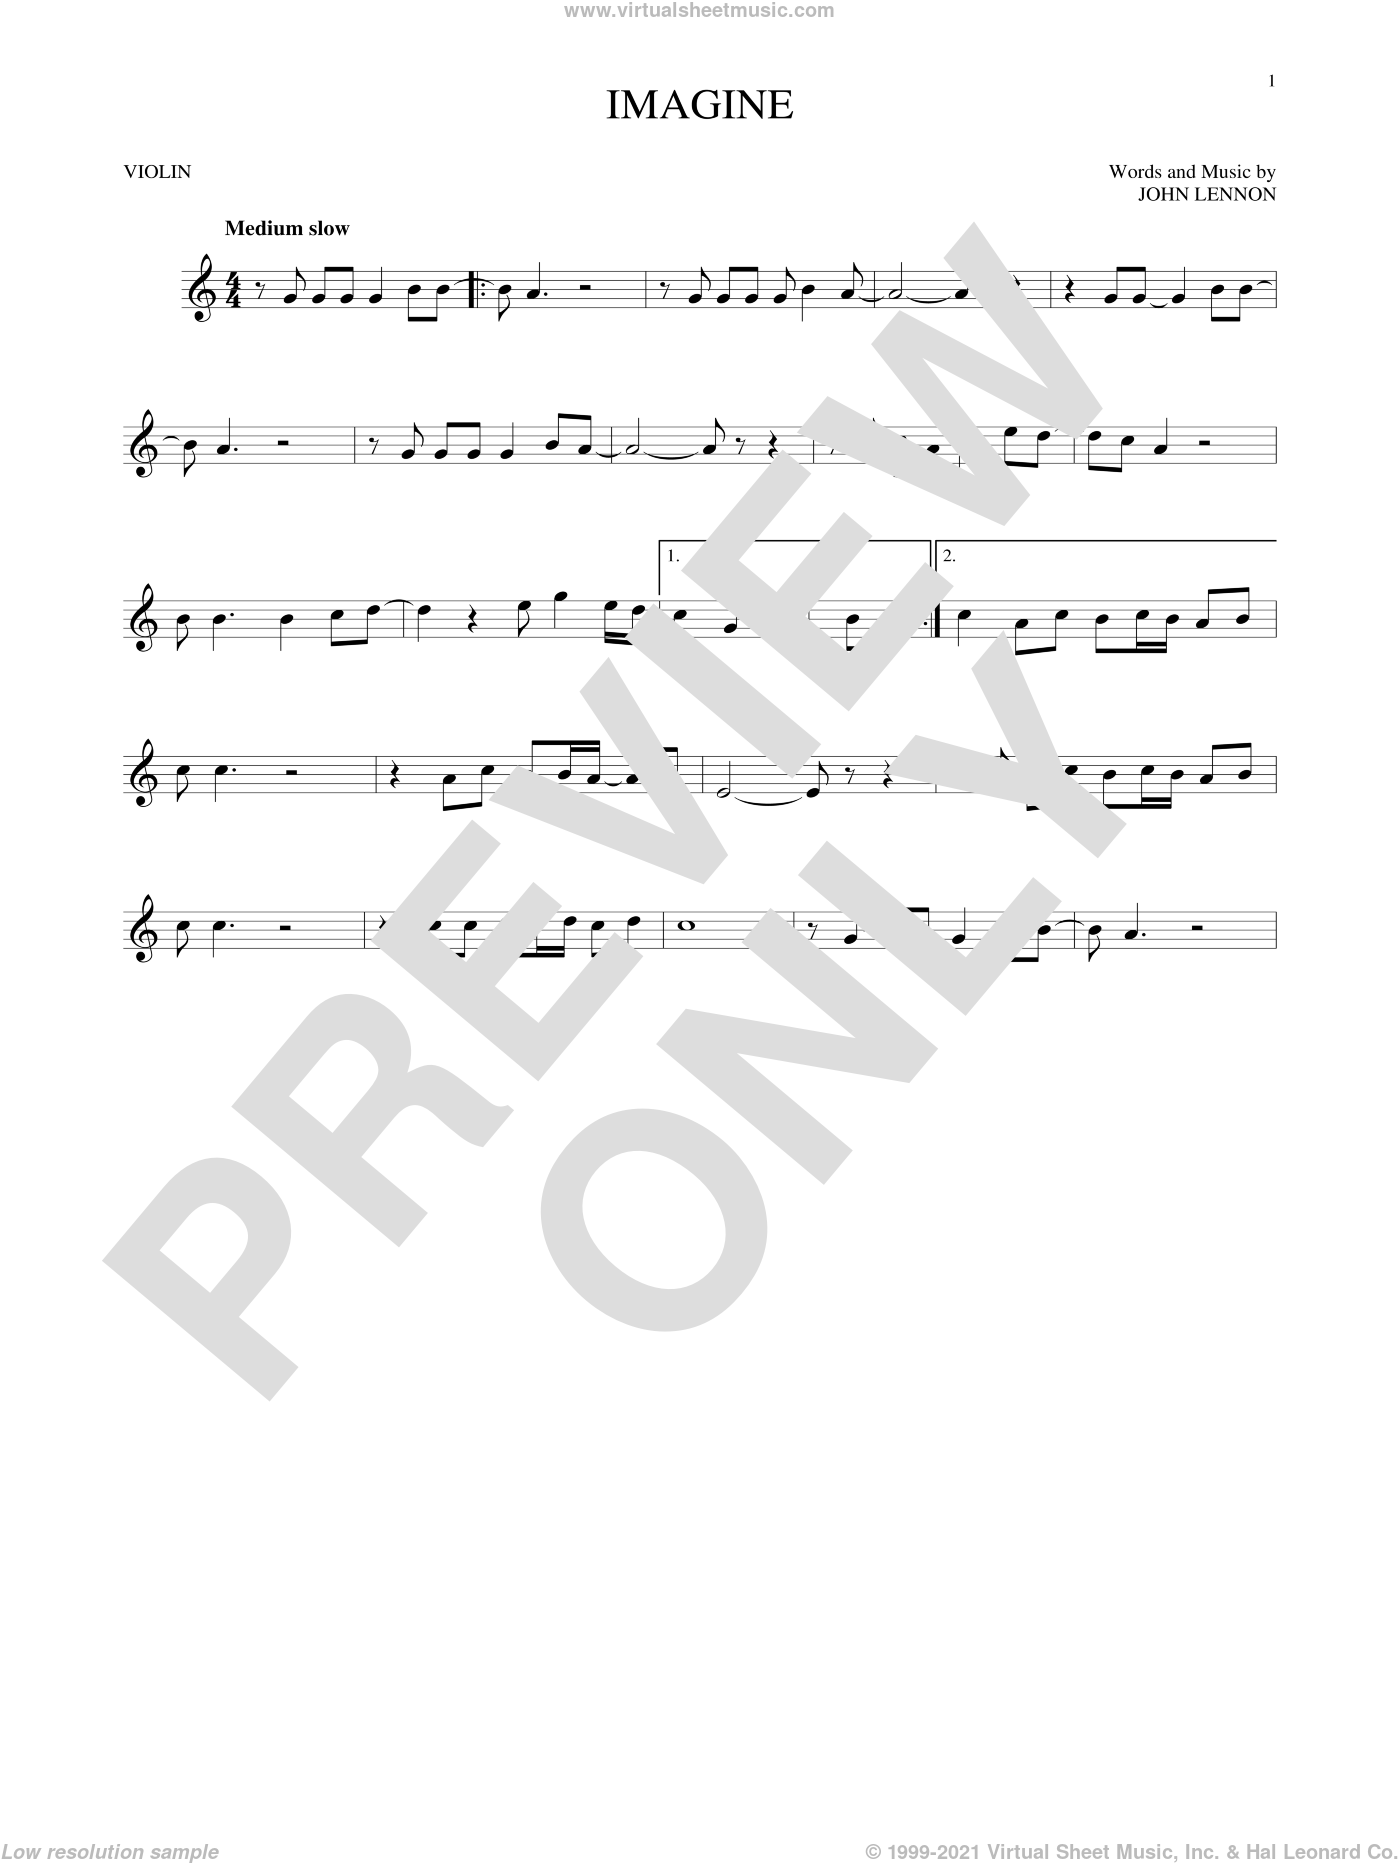 Imagine sheet music for violin solo by John Lennon, intermediate skill level